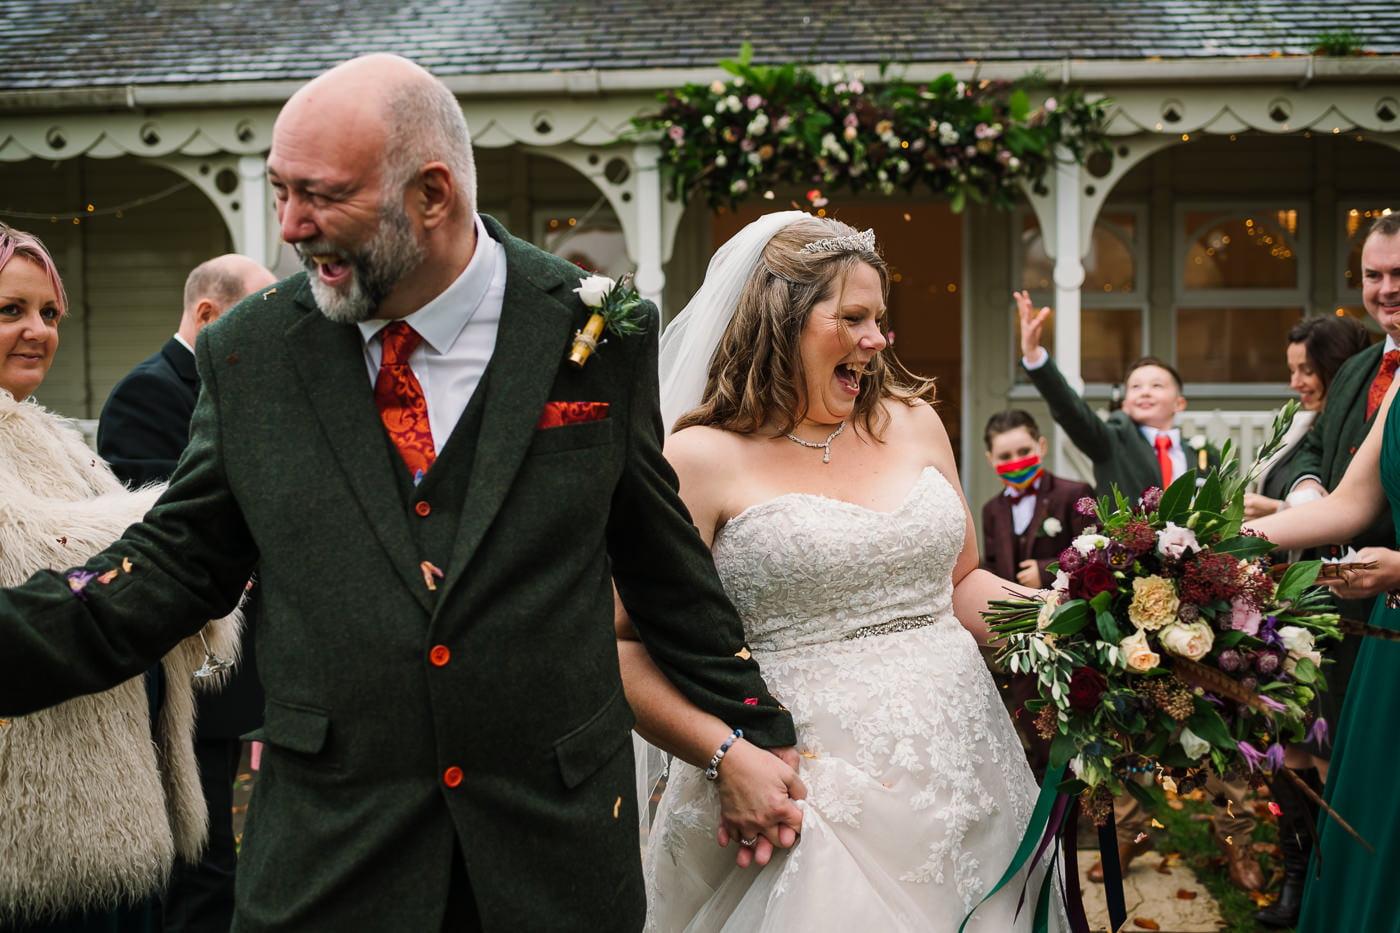 Covid safe wedding in dorset